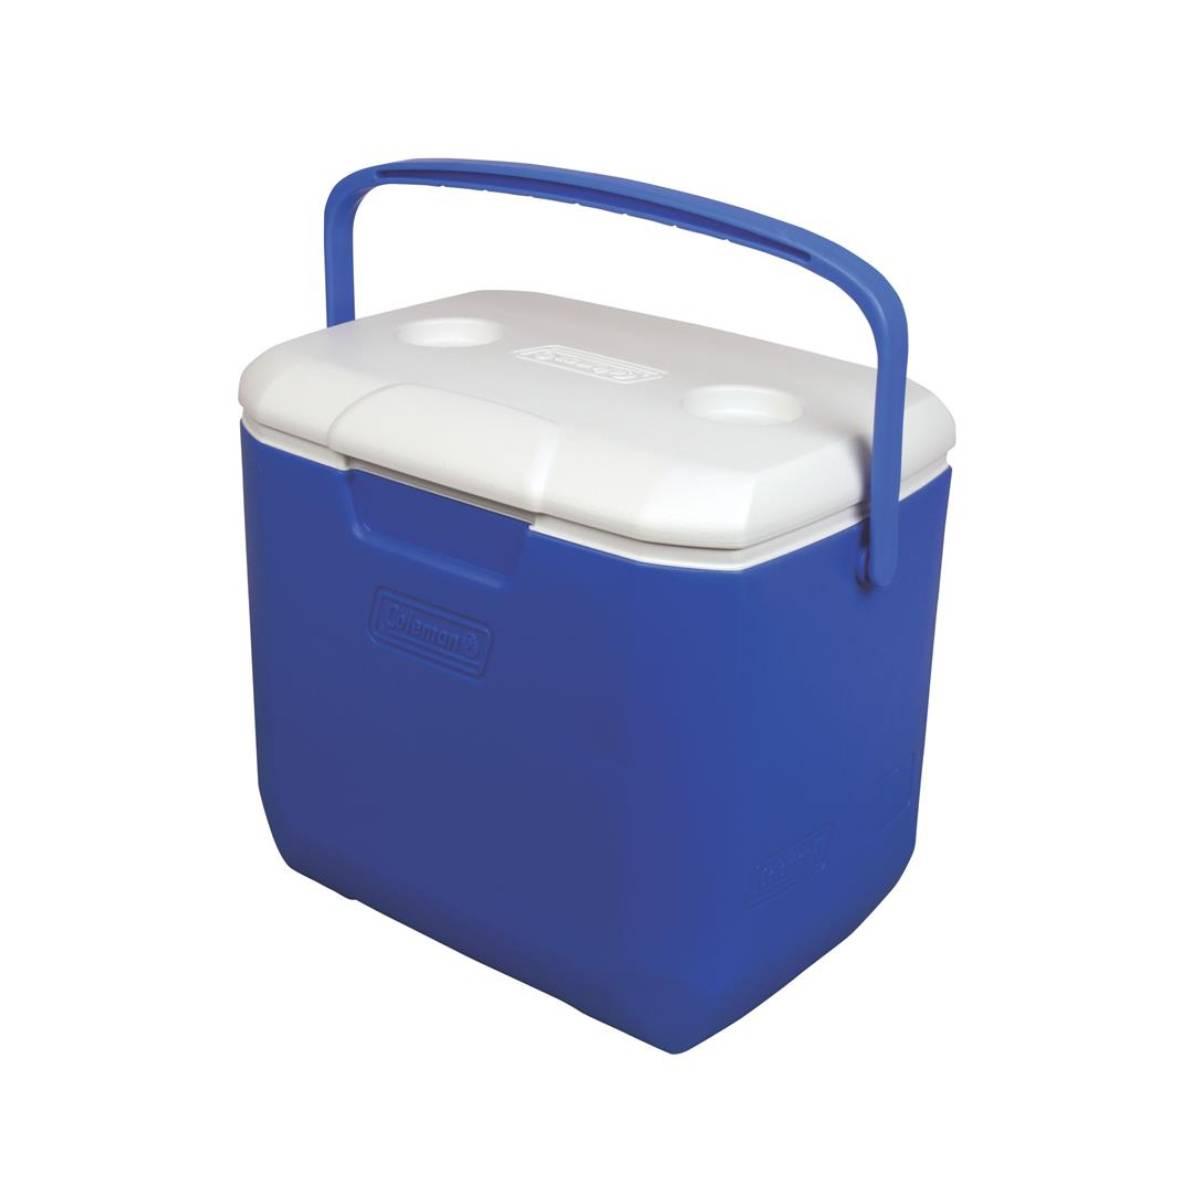 Hielera Azul 30 Qt Con Portavasos De Campismo Playa Coleman